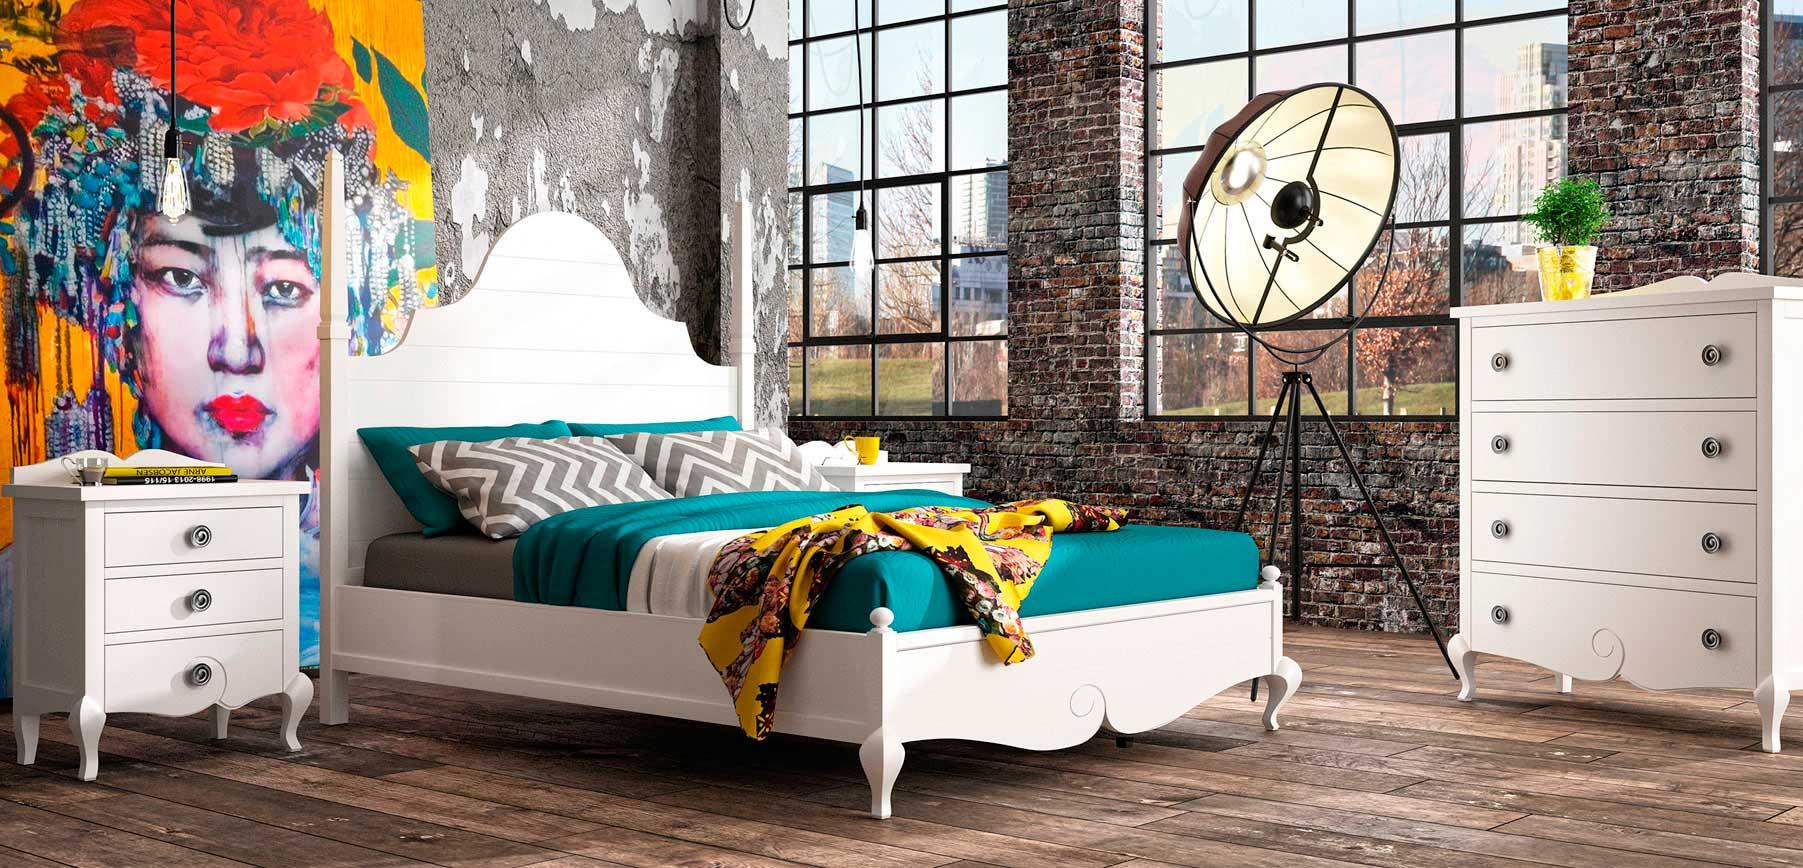 Muebles GRUPOSEYS - Muebles | Furniture | Meubles | мебель seys-3-optim Inicio